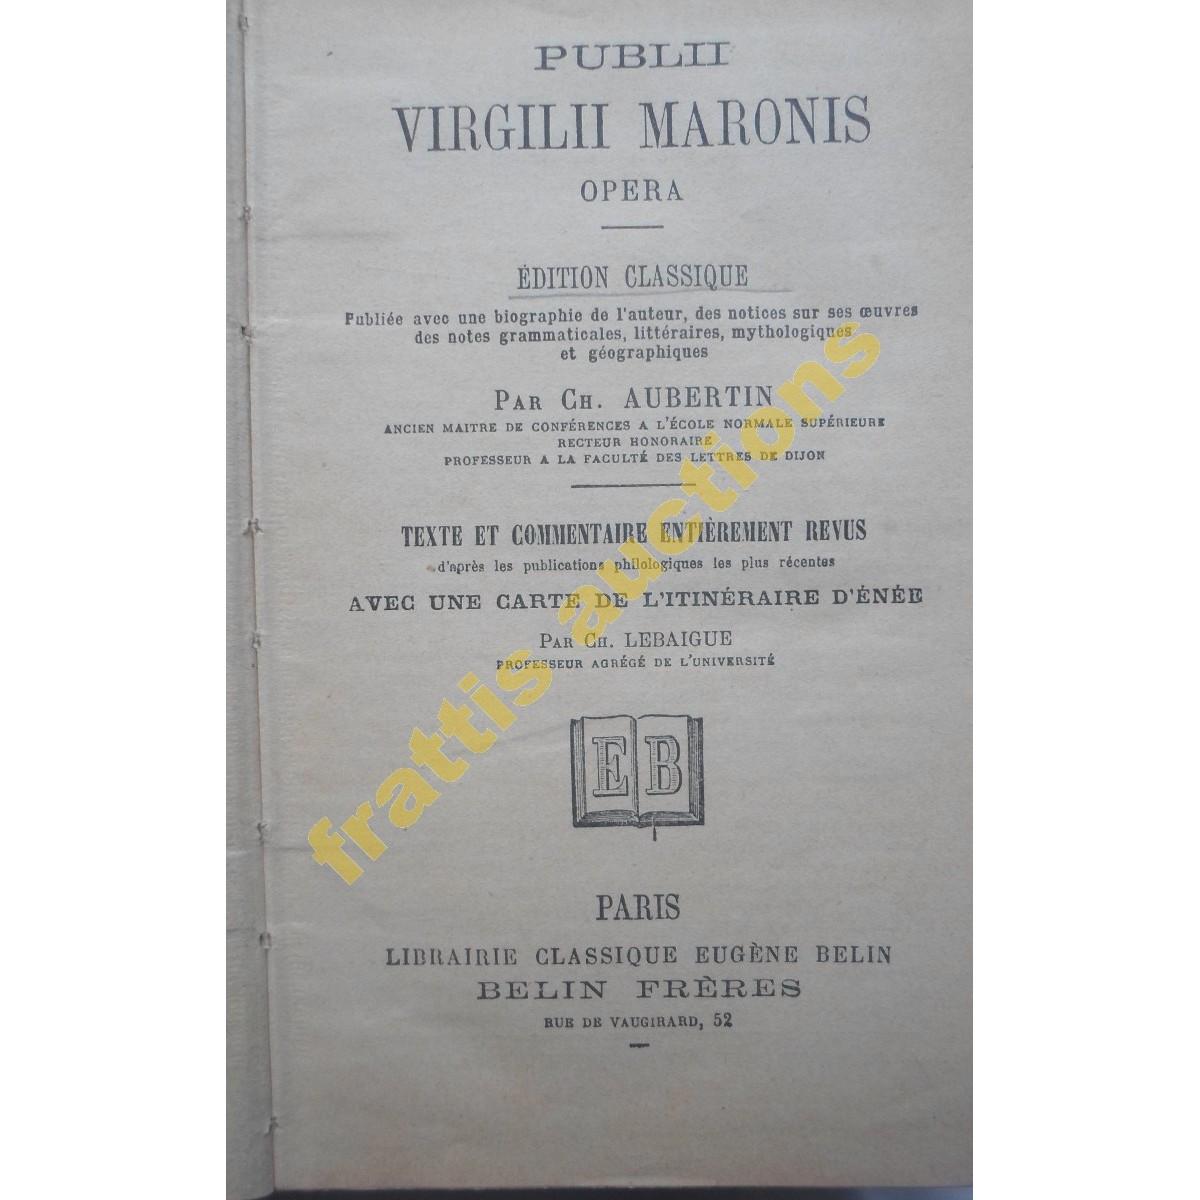 PUBLII VIRGILII MARONIS, OPERA VIRGILE par Ch. AUBERTIN 18os